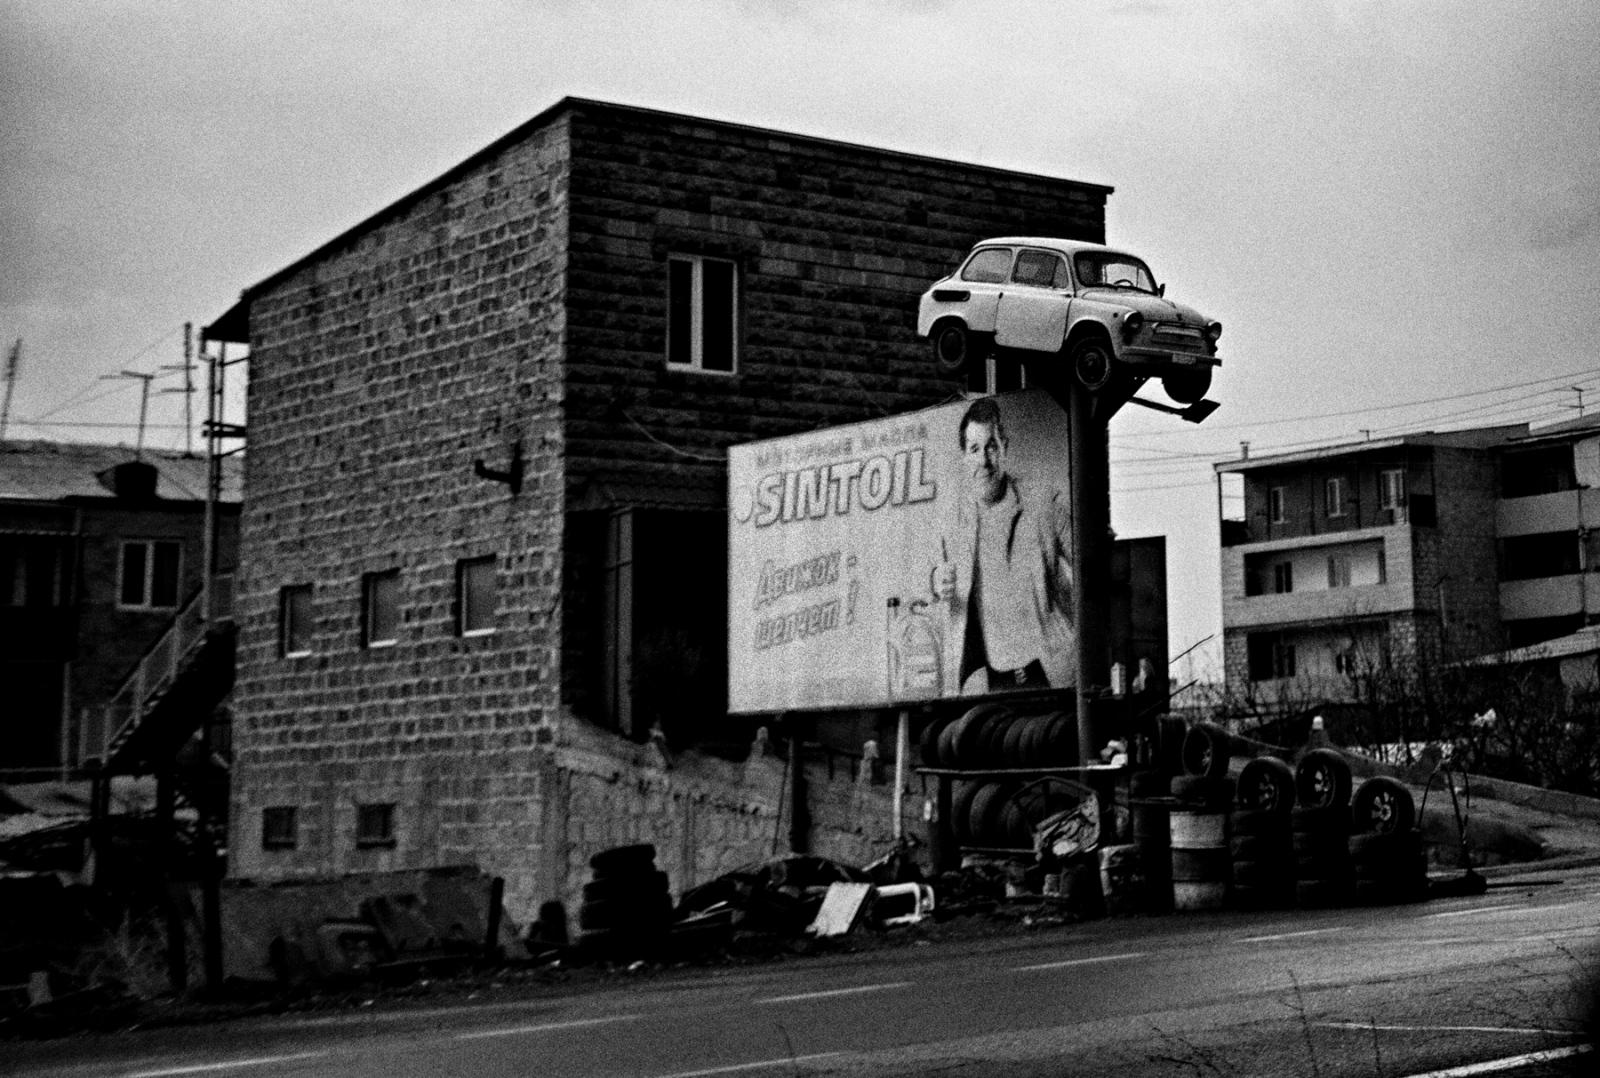 A mechanic shop on the road from Yerevan to Ashtarak, Armenia.